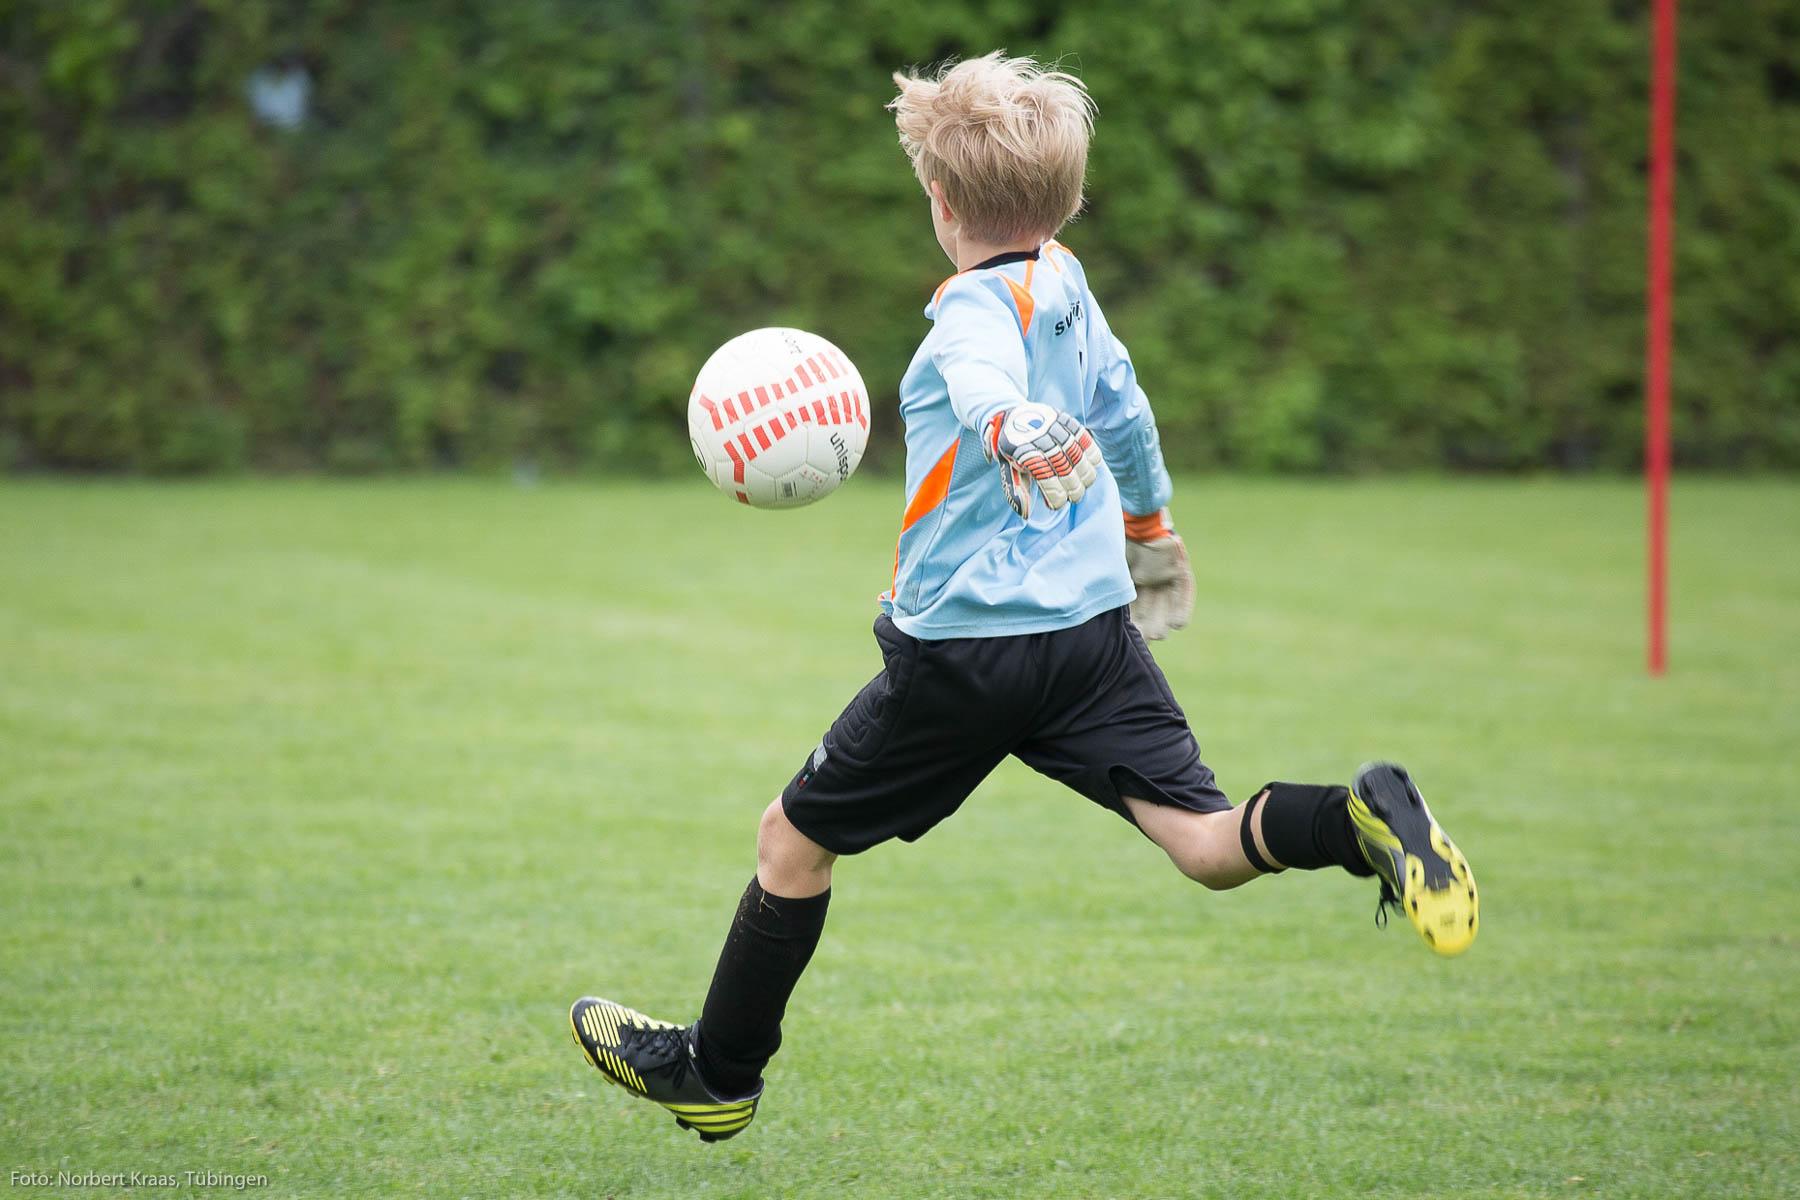 Fußball mit Gefühl. Foto: Norbert Kraas